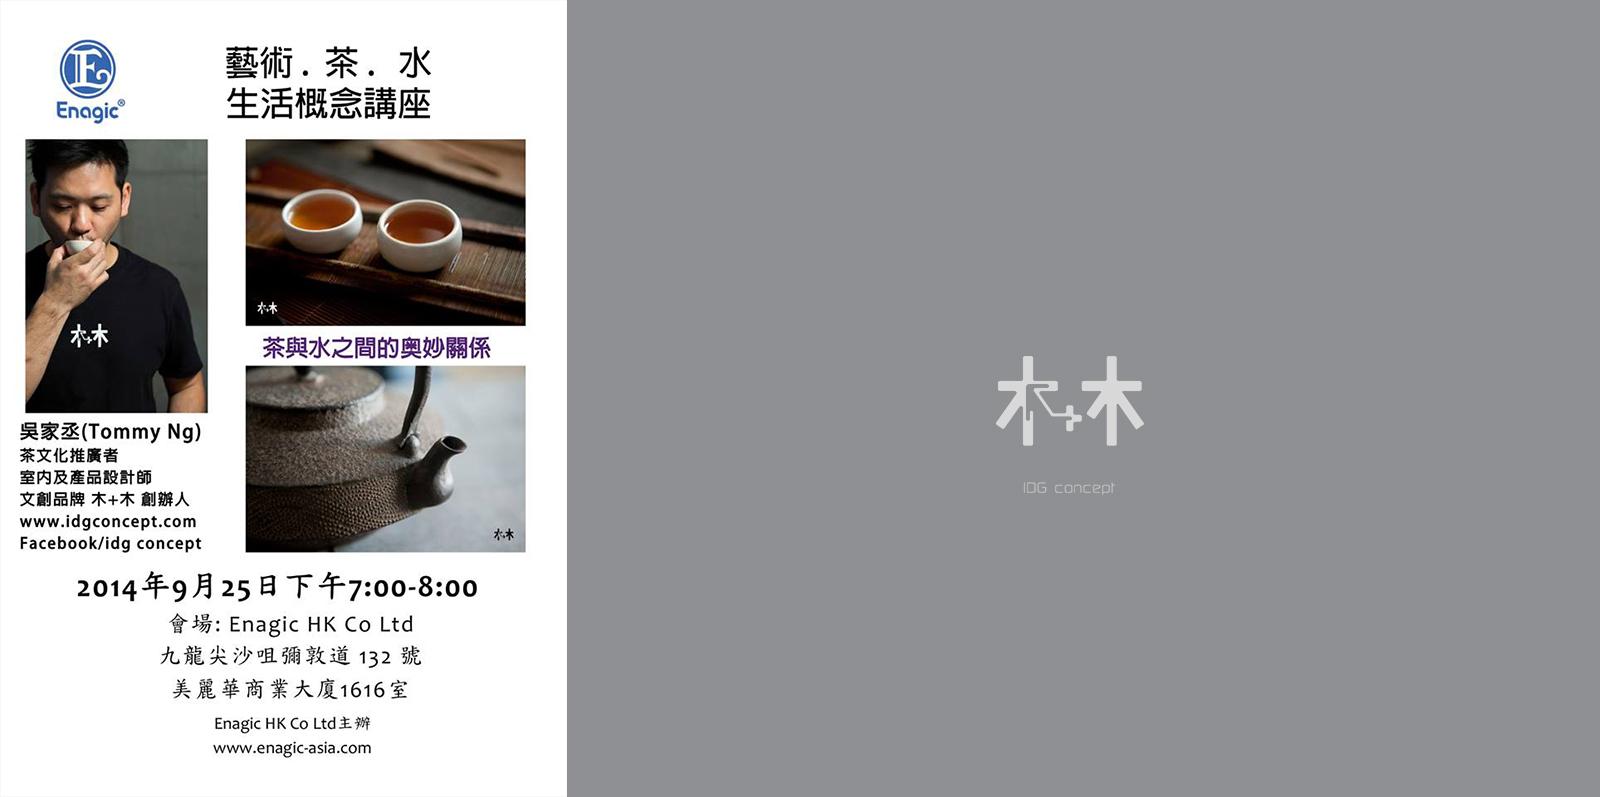 Tommy 日前應 Enagic Asia誠邀,主講 【藝術 . 茶 . 水 --- 生活概念講座】。